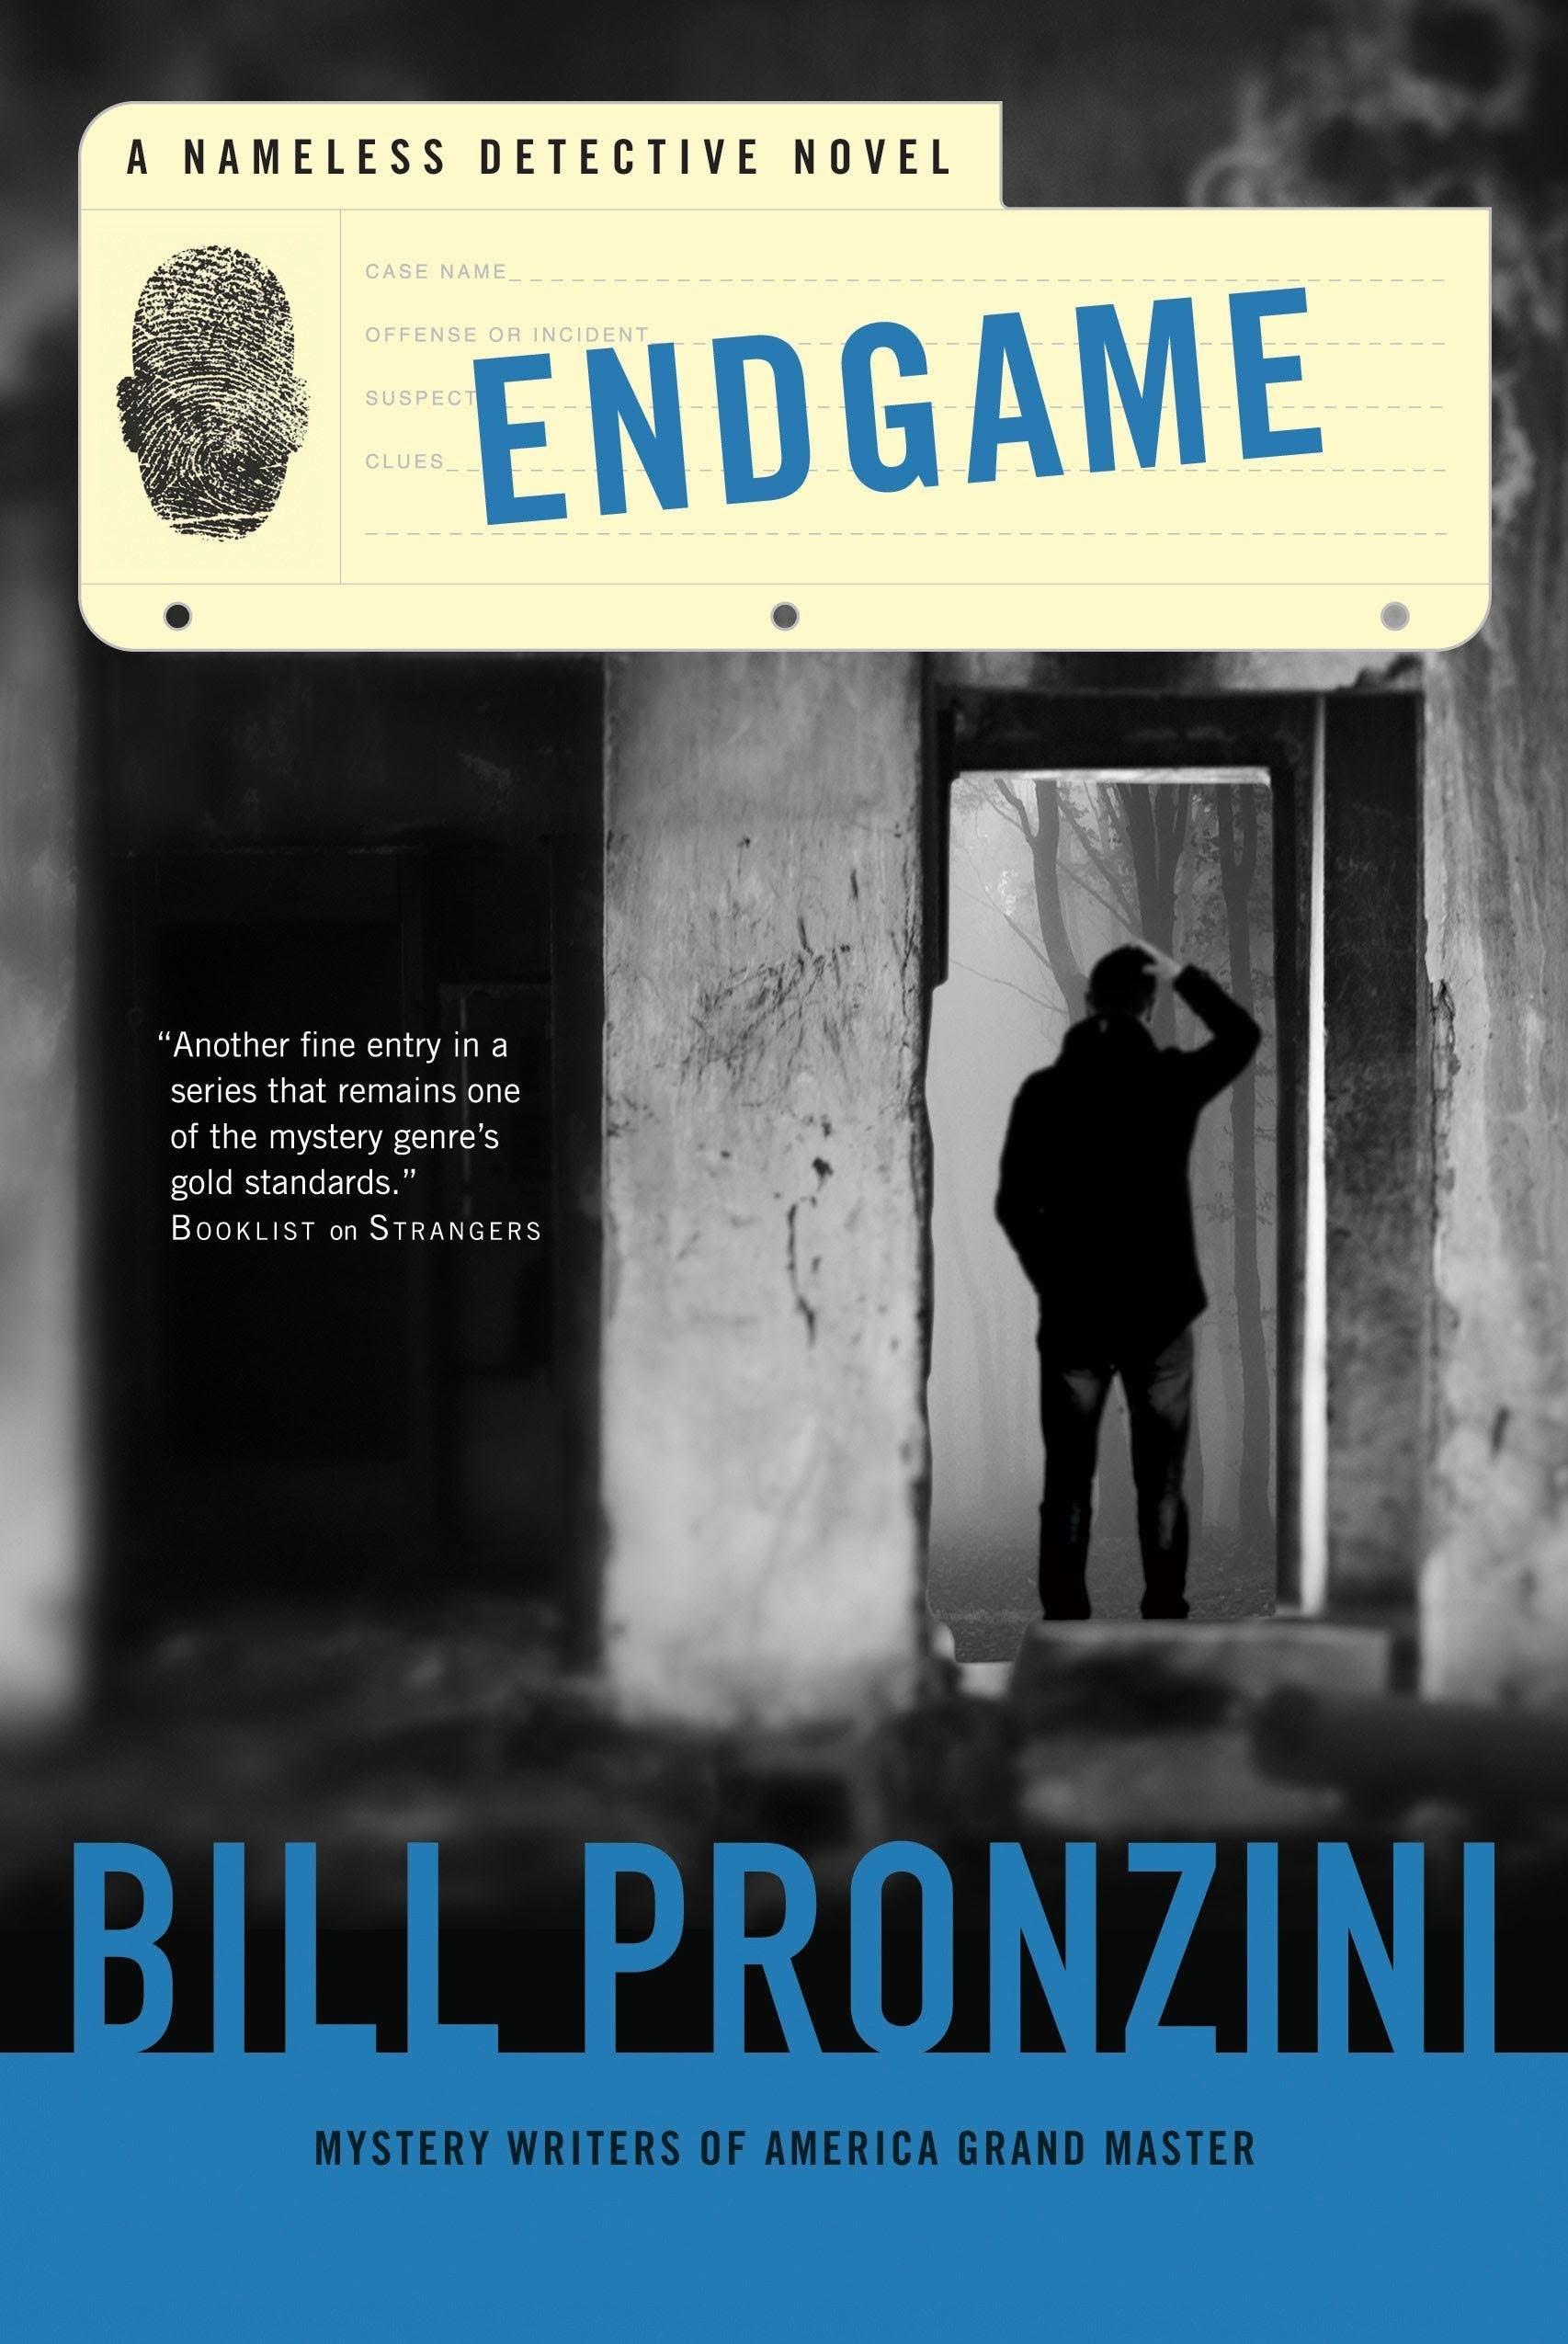 Image of Endgame